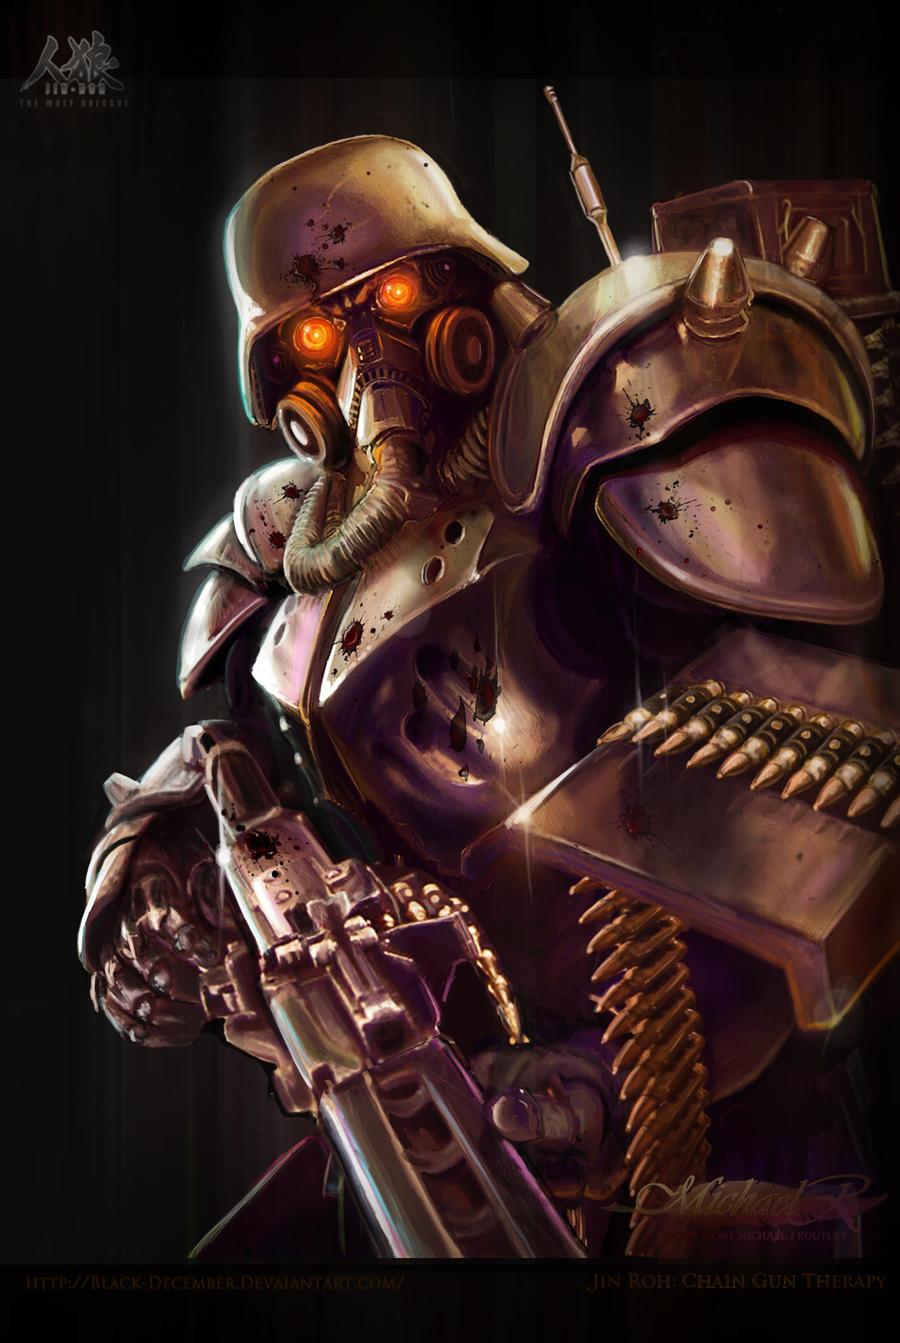 Jin Roh: Chain Gun Therapy by Trezykx